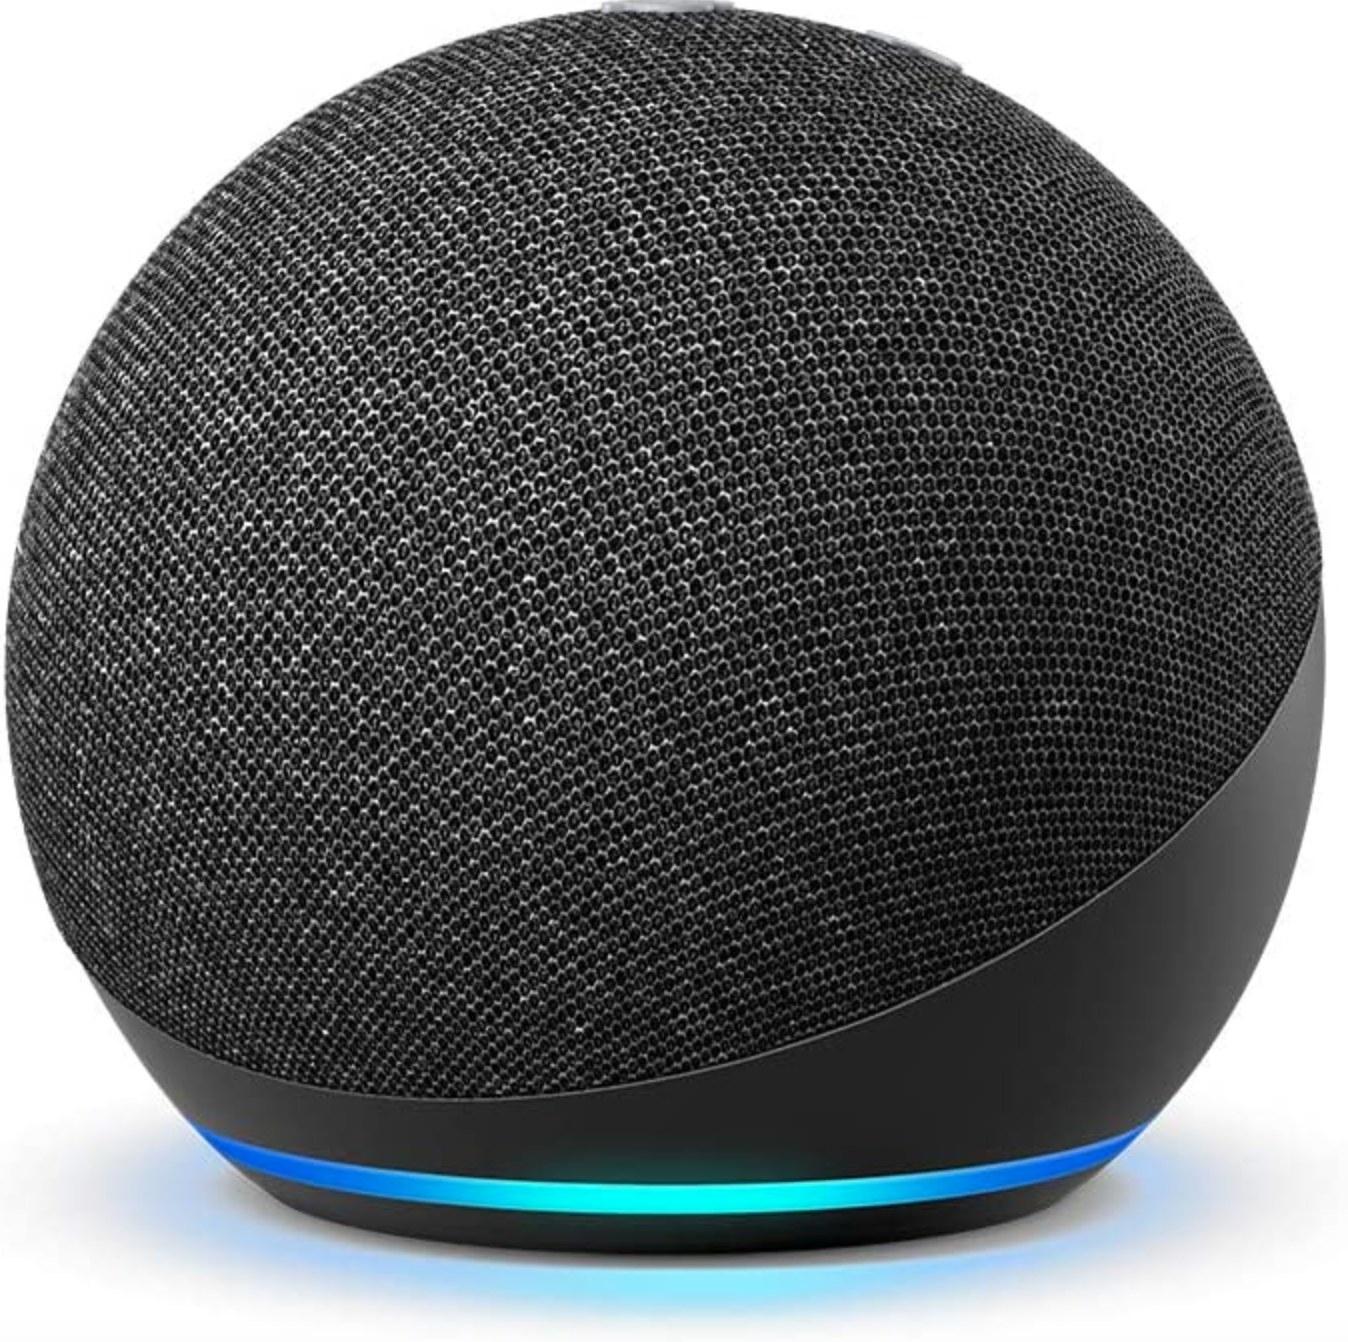 The Alexa Echo Dot